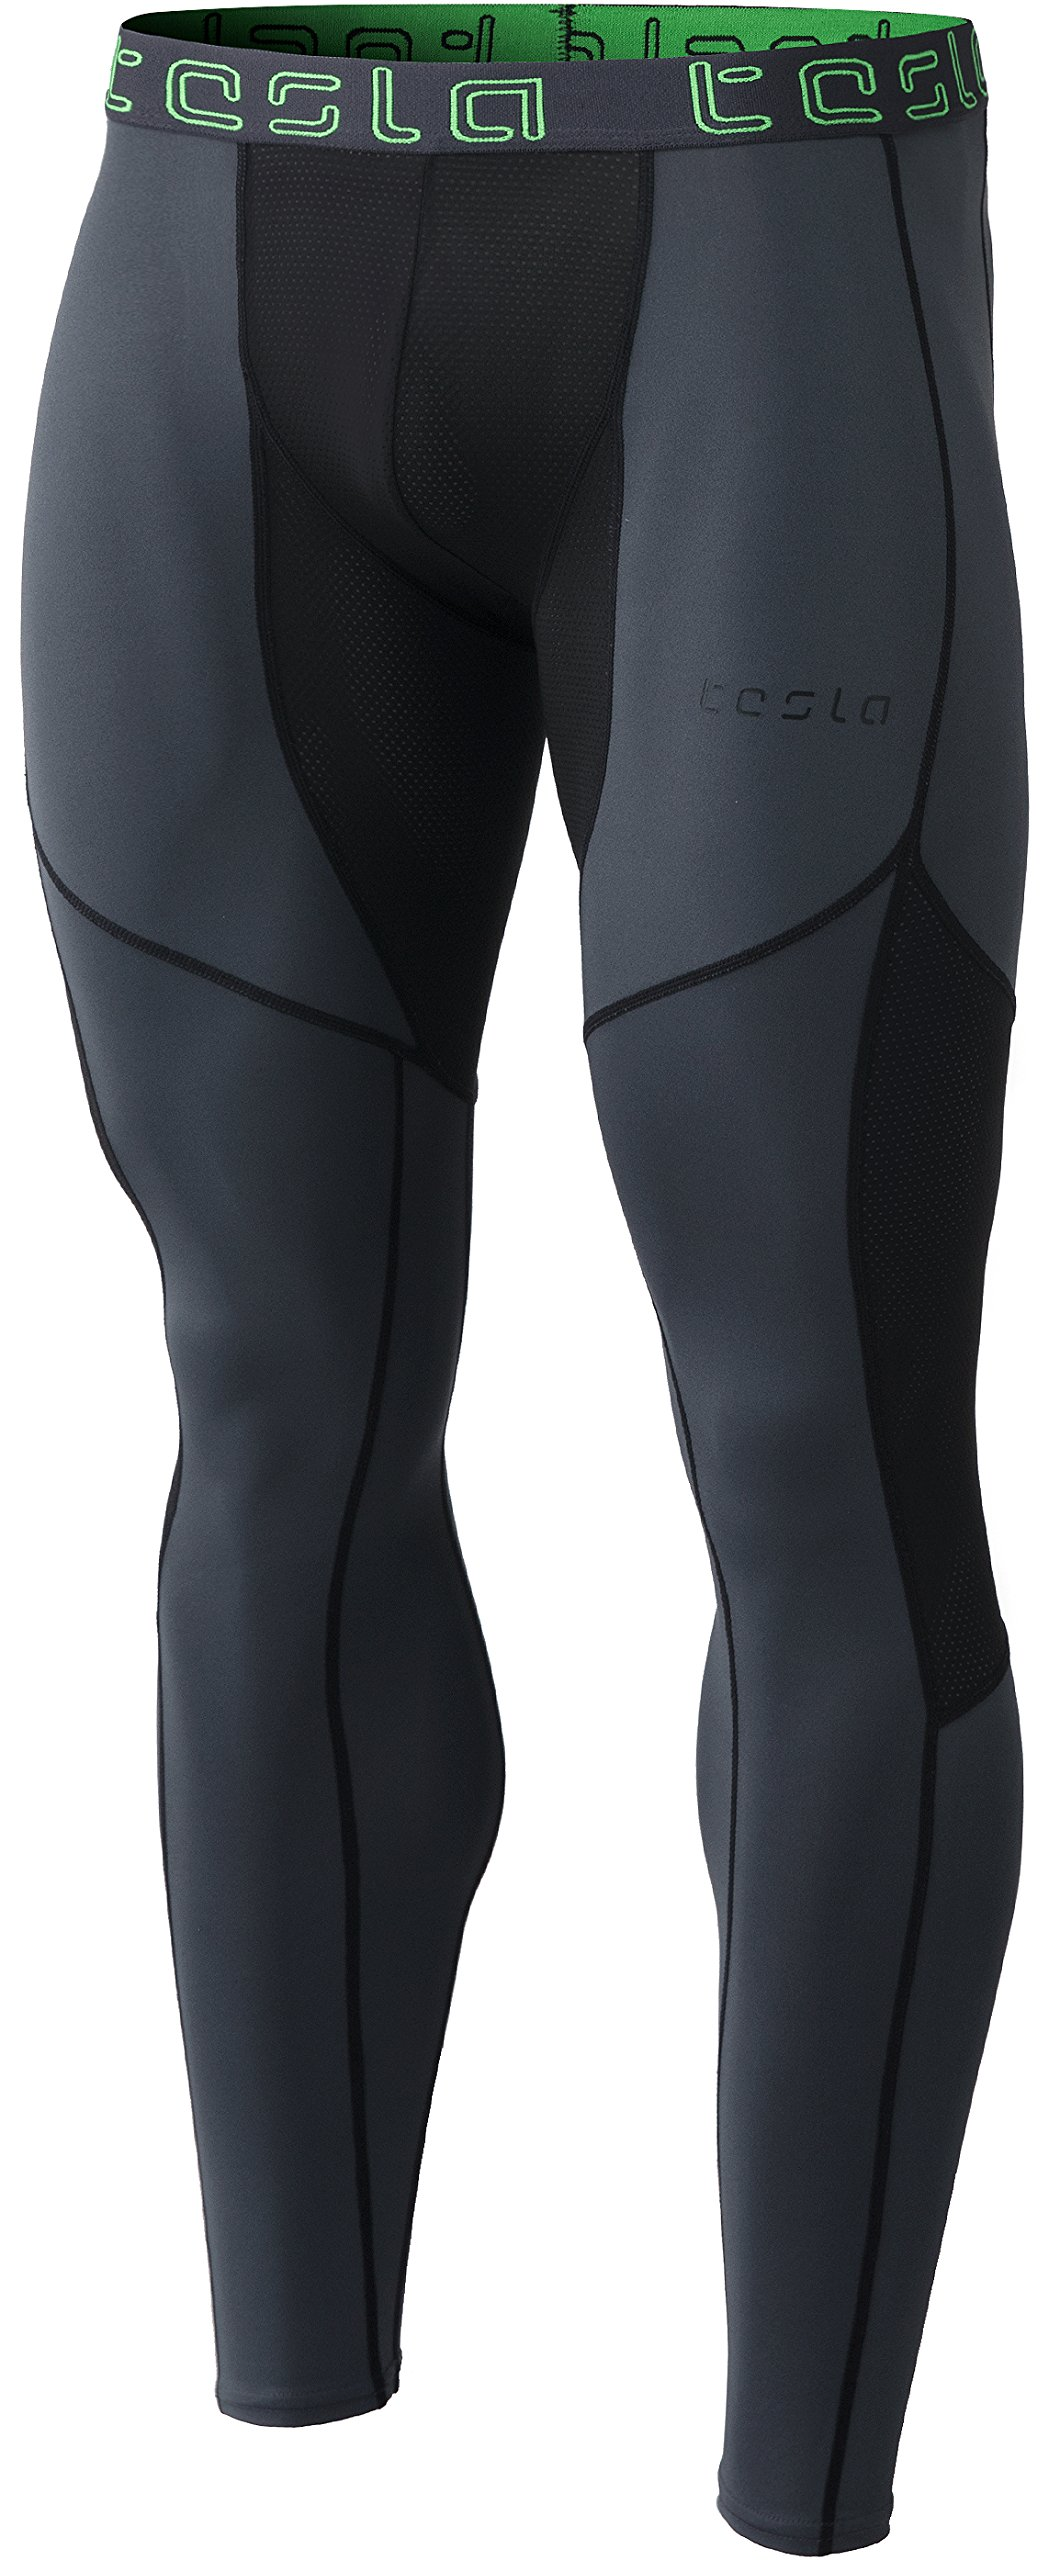 Tesla TM-MUP79-CHK_2X-Large Men's Mesh-Panel Compression Pants Baselayer Cool Dry Sports Tights Leggings MUP79